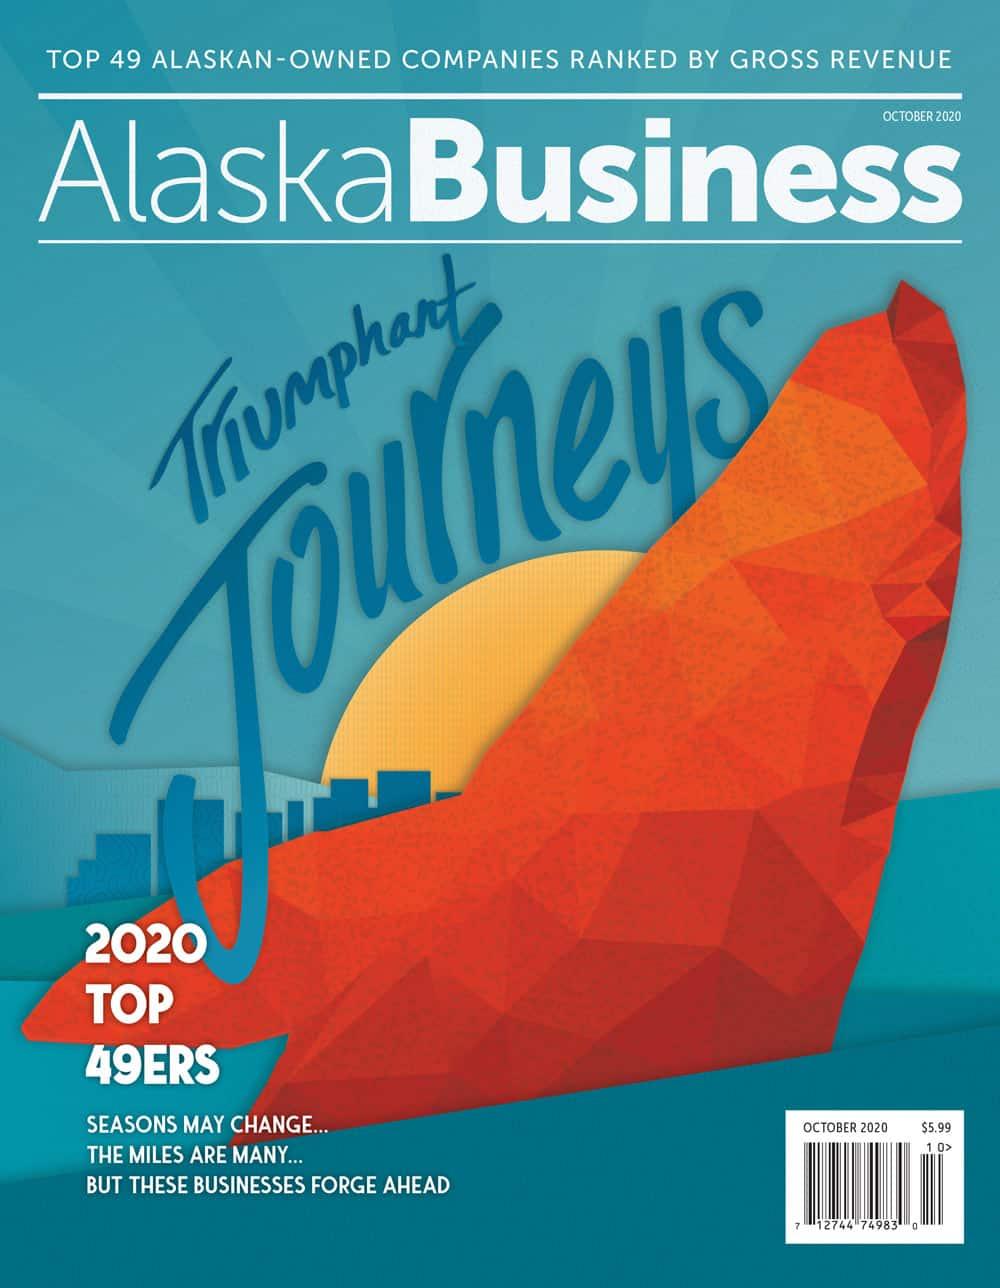 Alaska Business Magazine October 2020 Cover